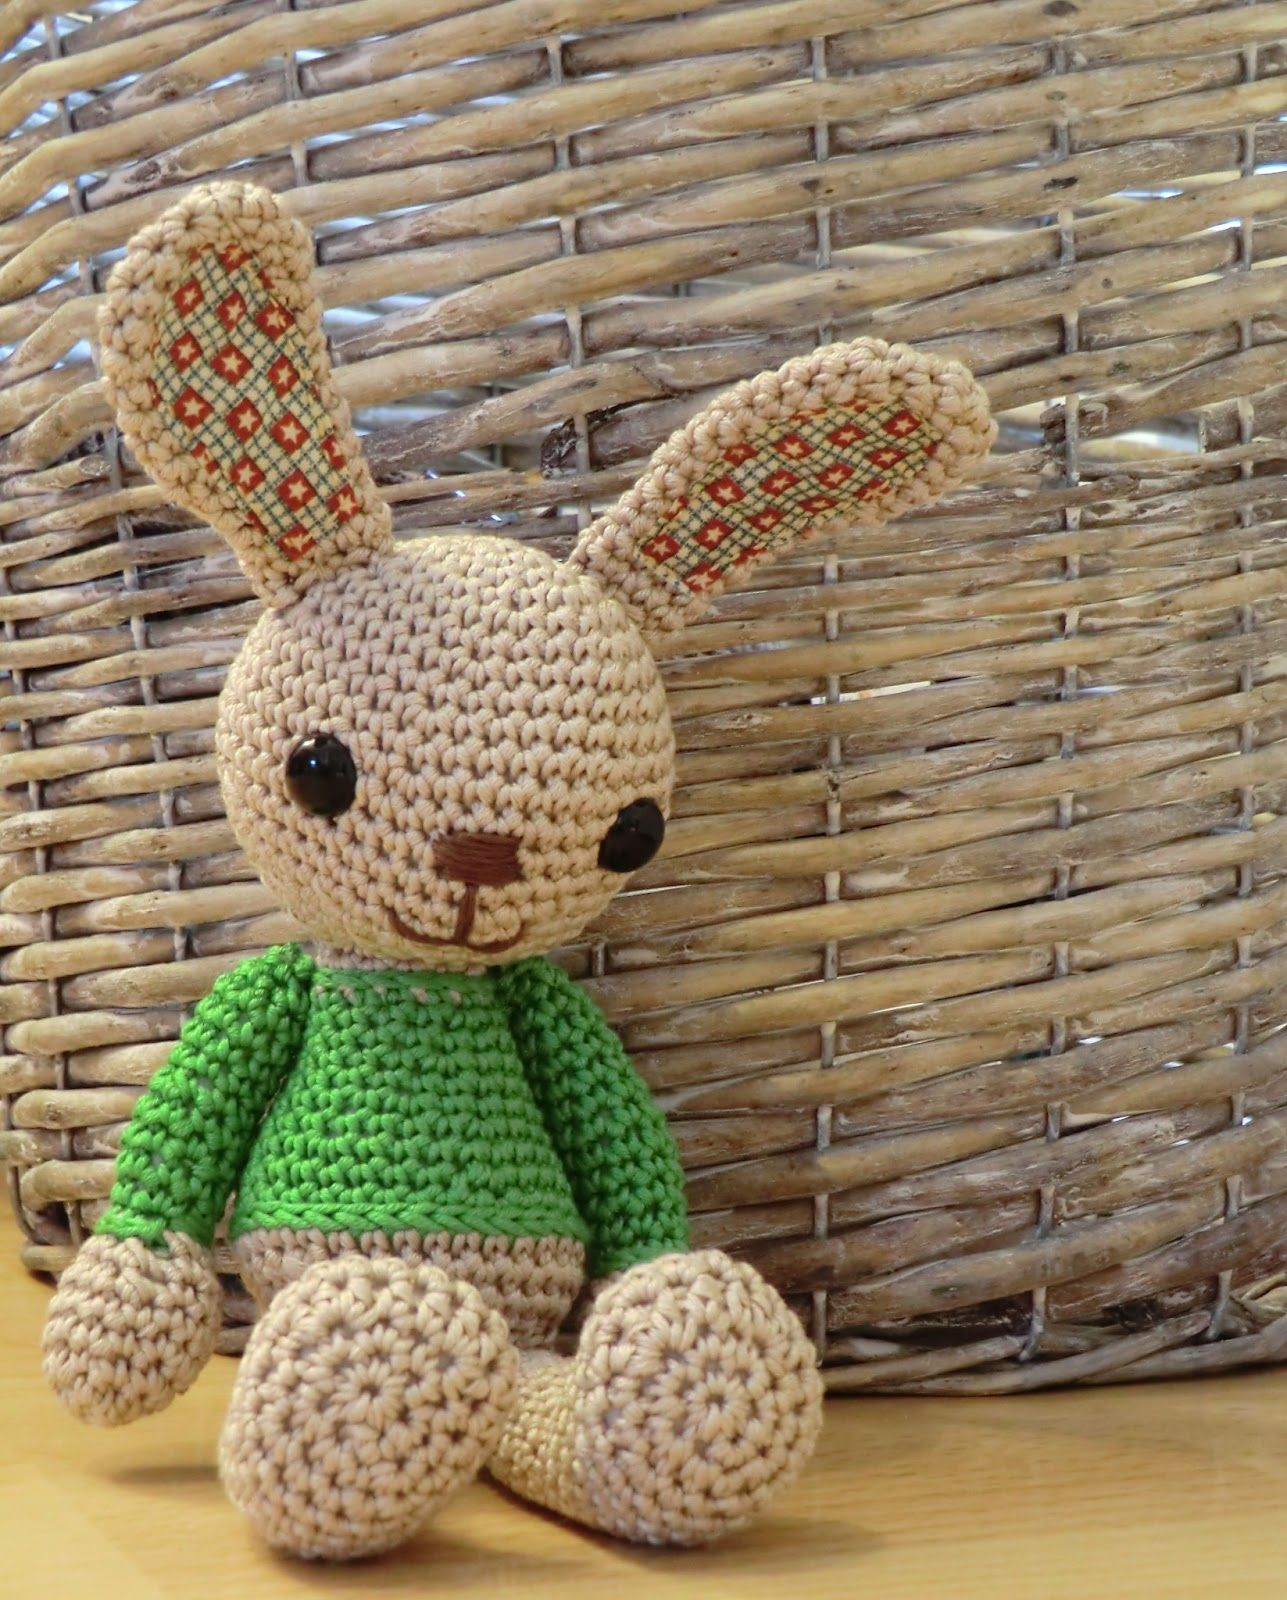 Crochet pattern: Amigurumi Barmy:bunny amigurumi | Funny chrochet ...